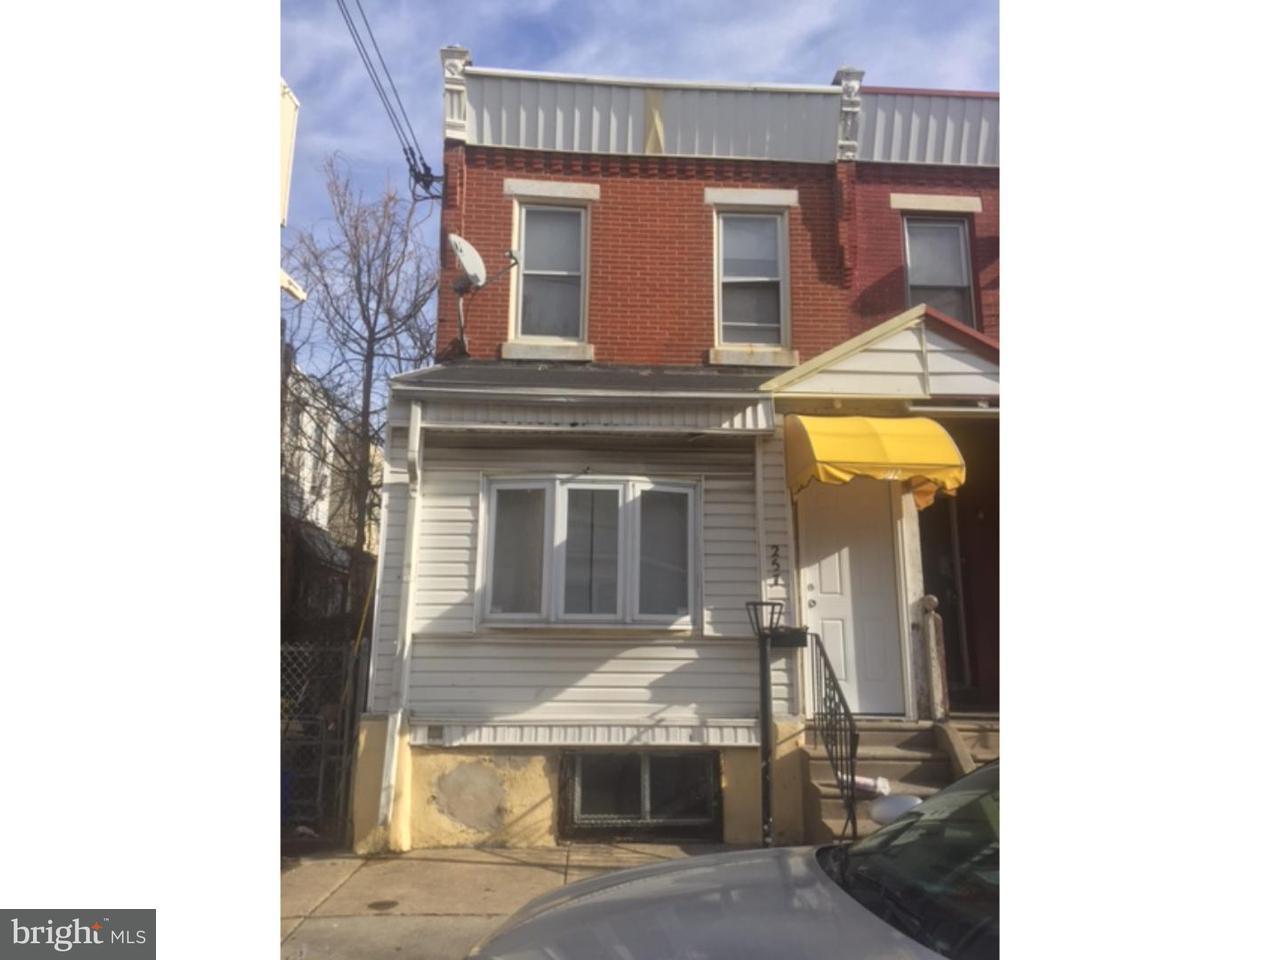 257 N Hobart Philadelphia, PA 19139